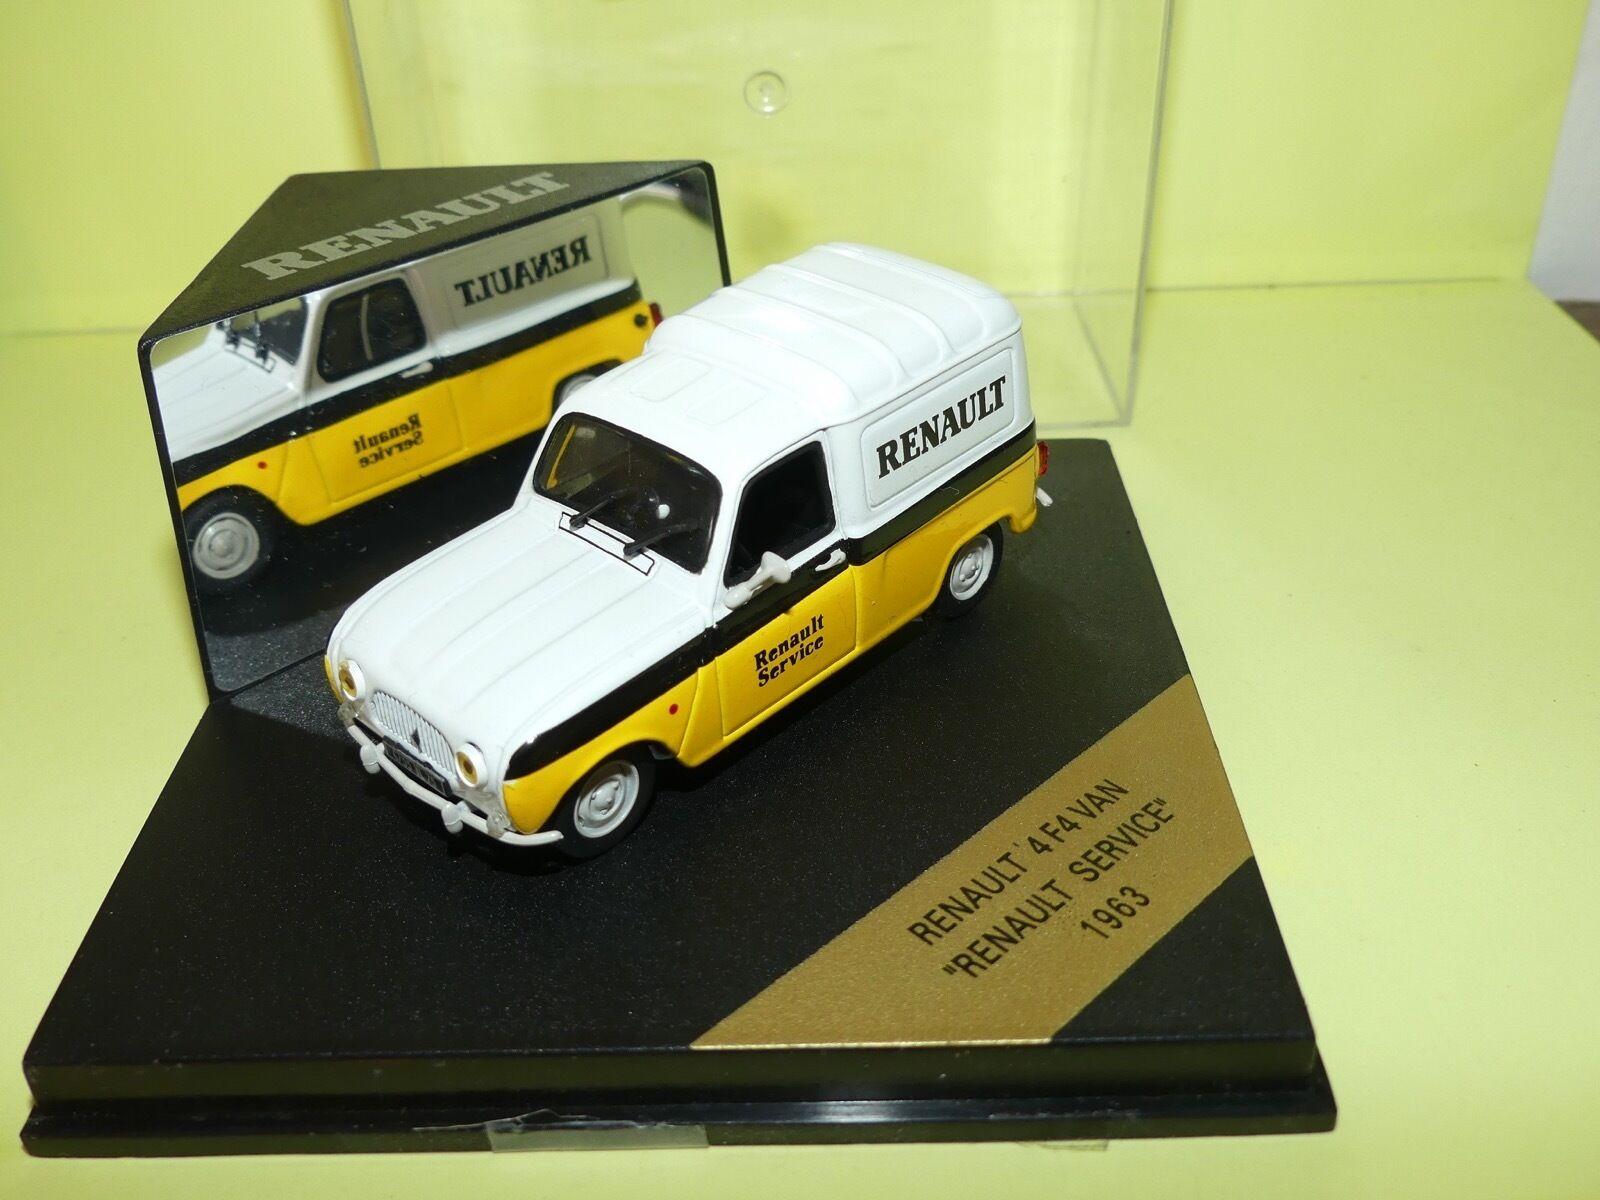 Renault 4 f4 van renault - 1963 1 43